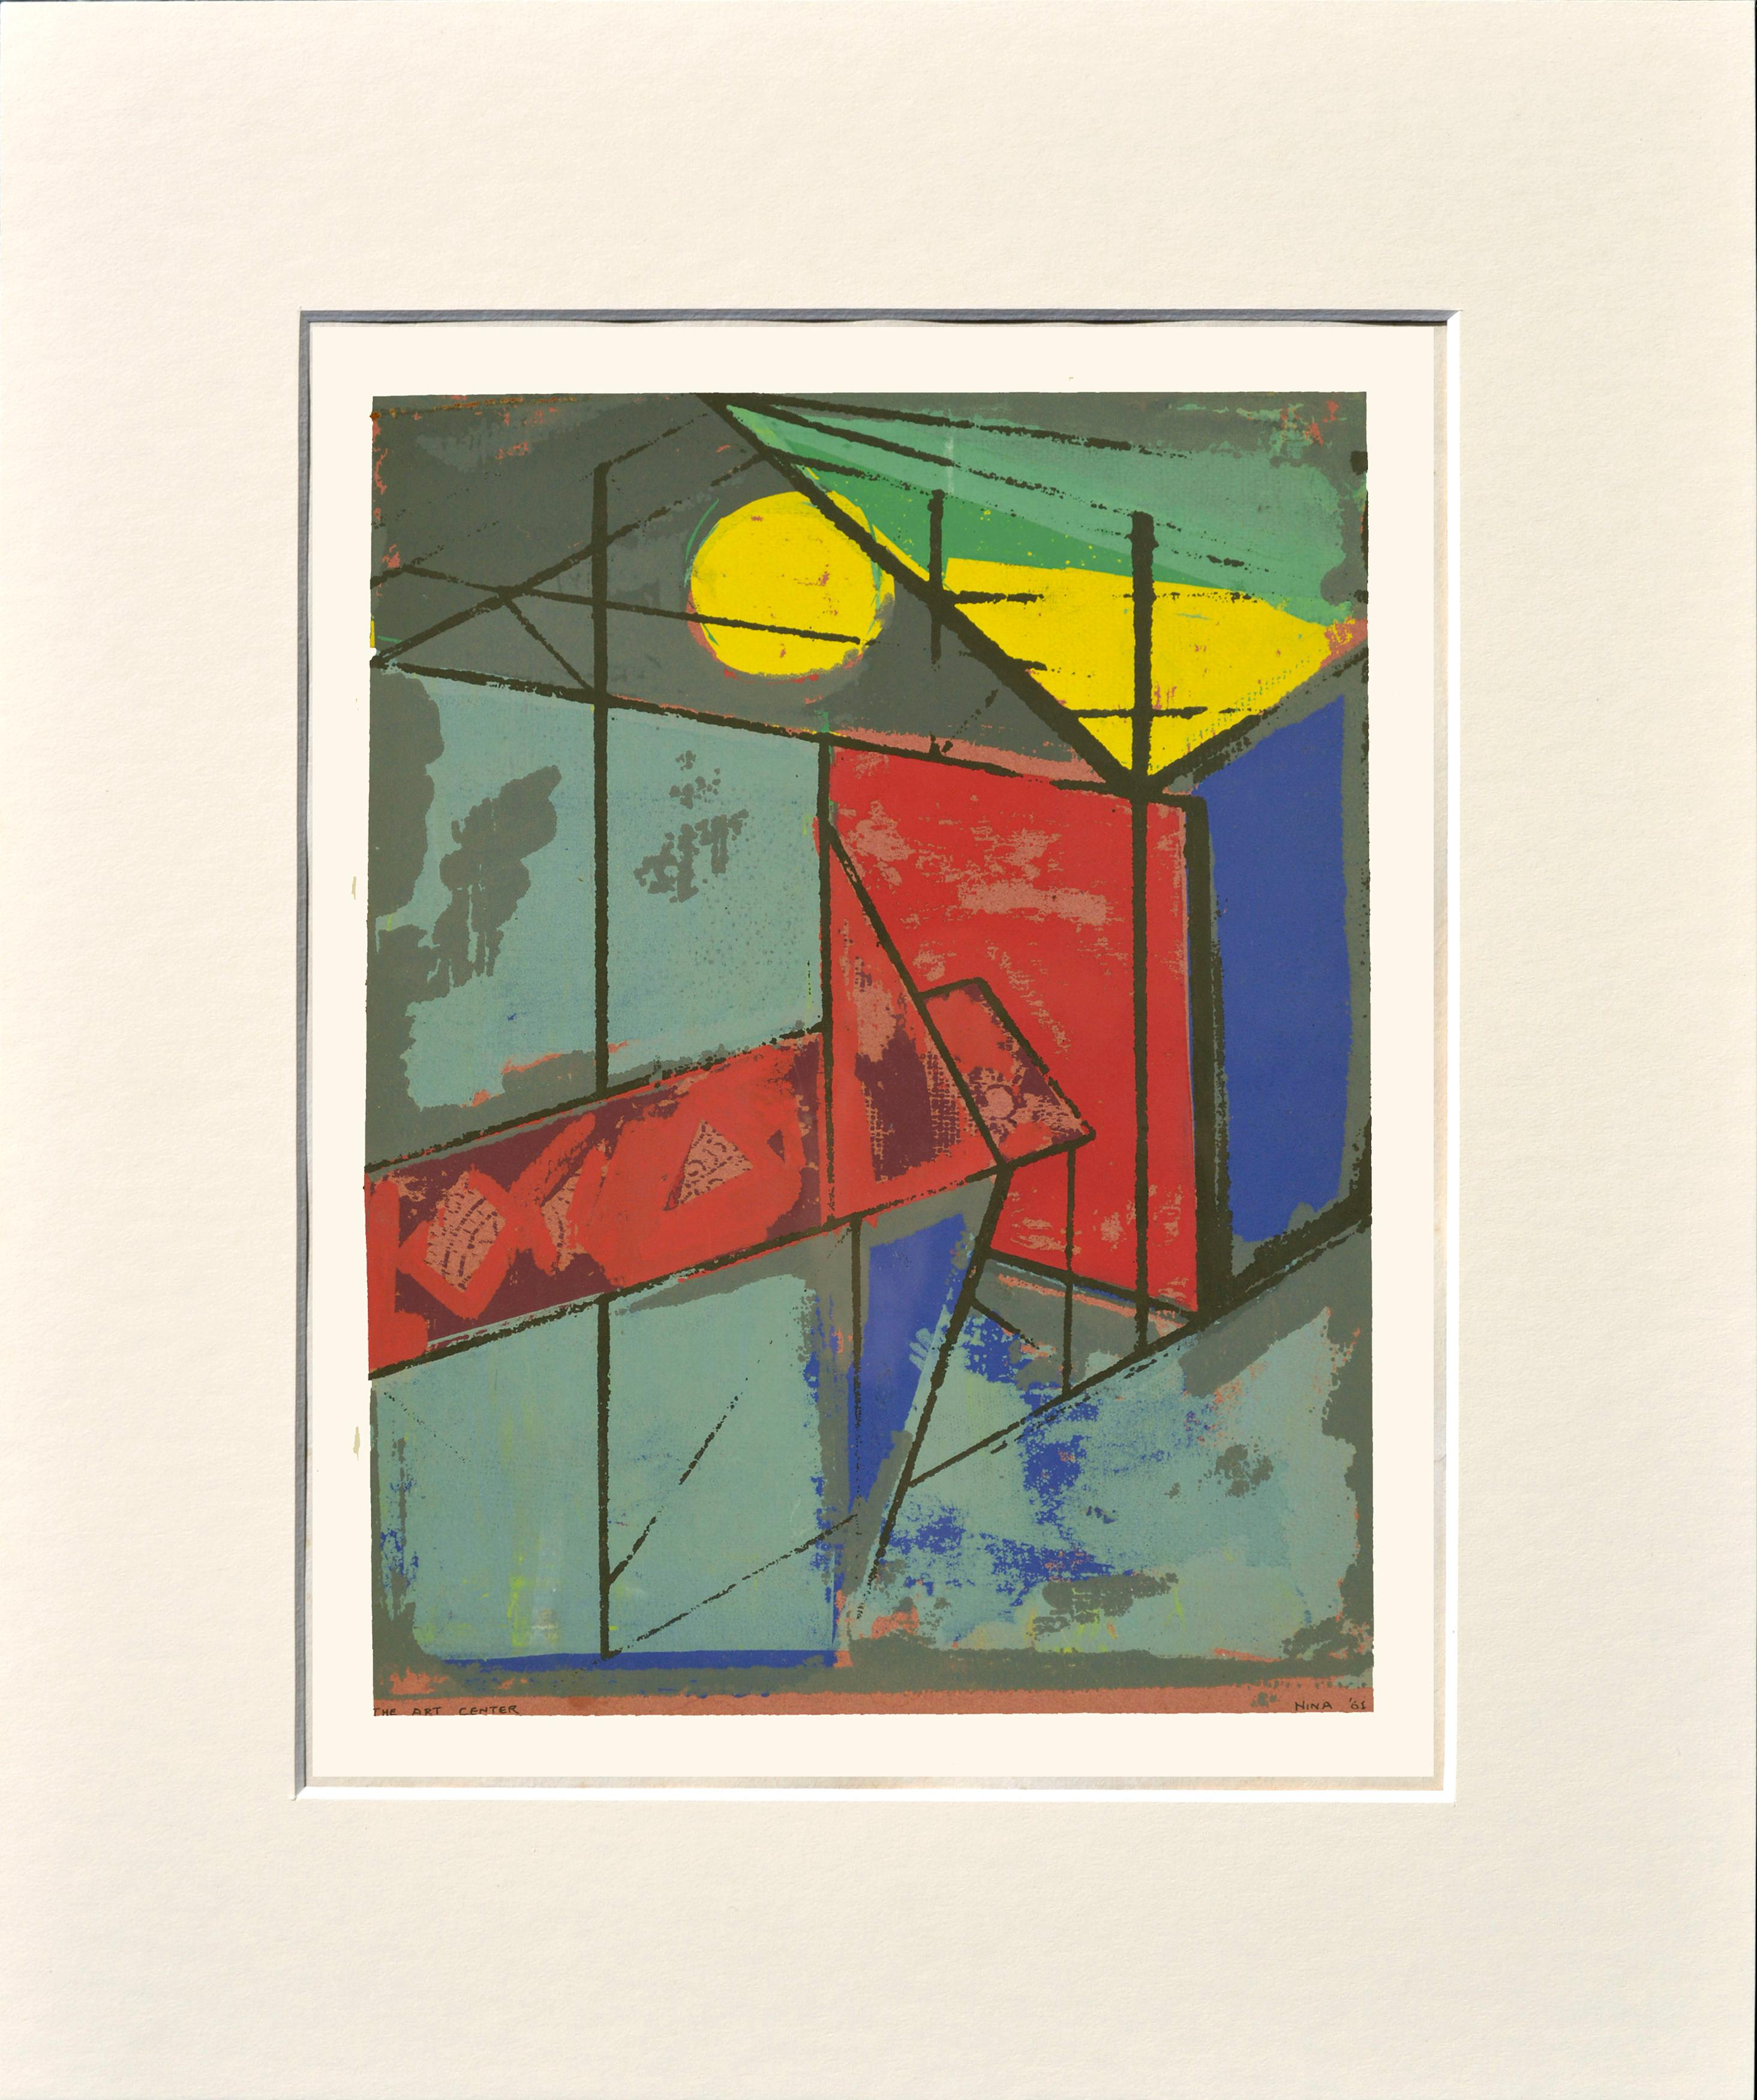 """The Art Center"" - Mid Century Urban Abstract Geometric Serigraph by Nina"